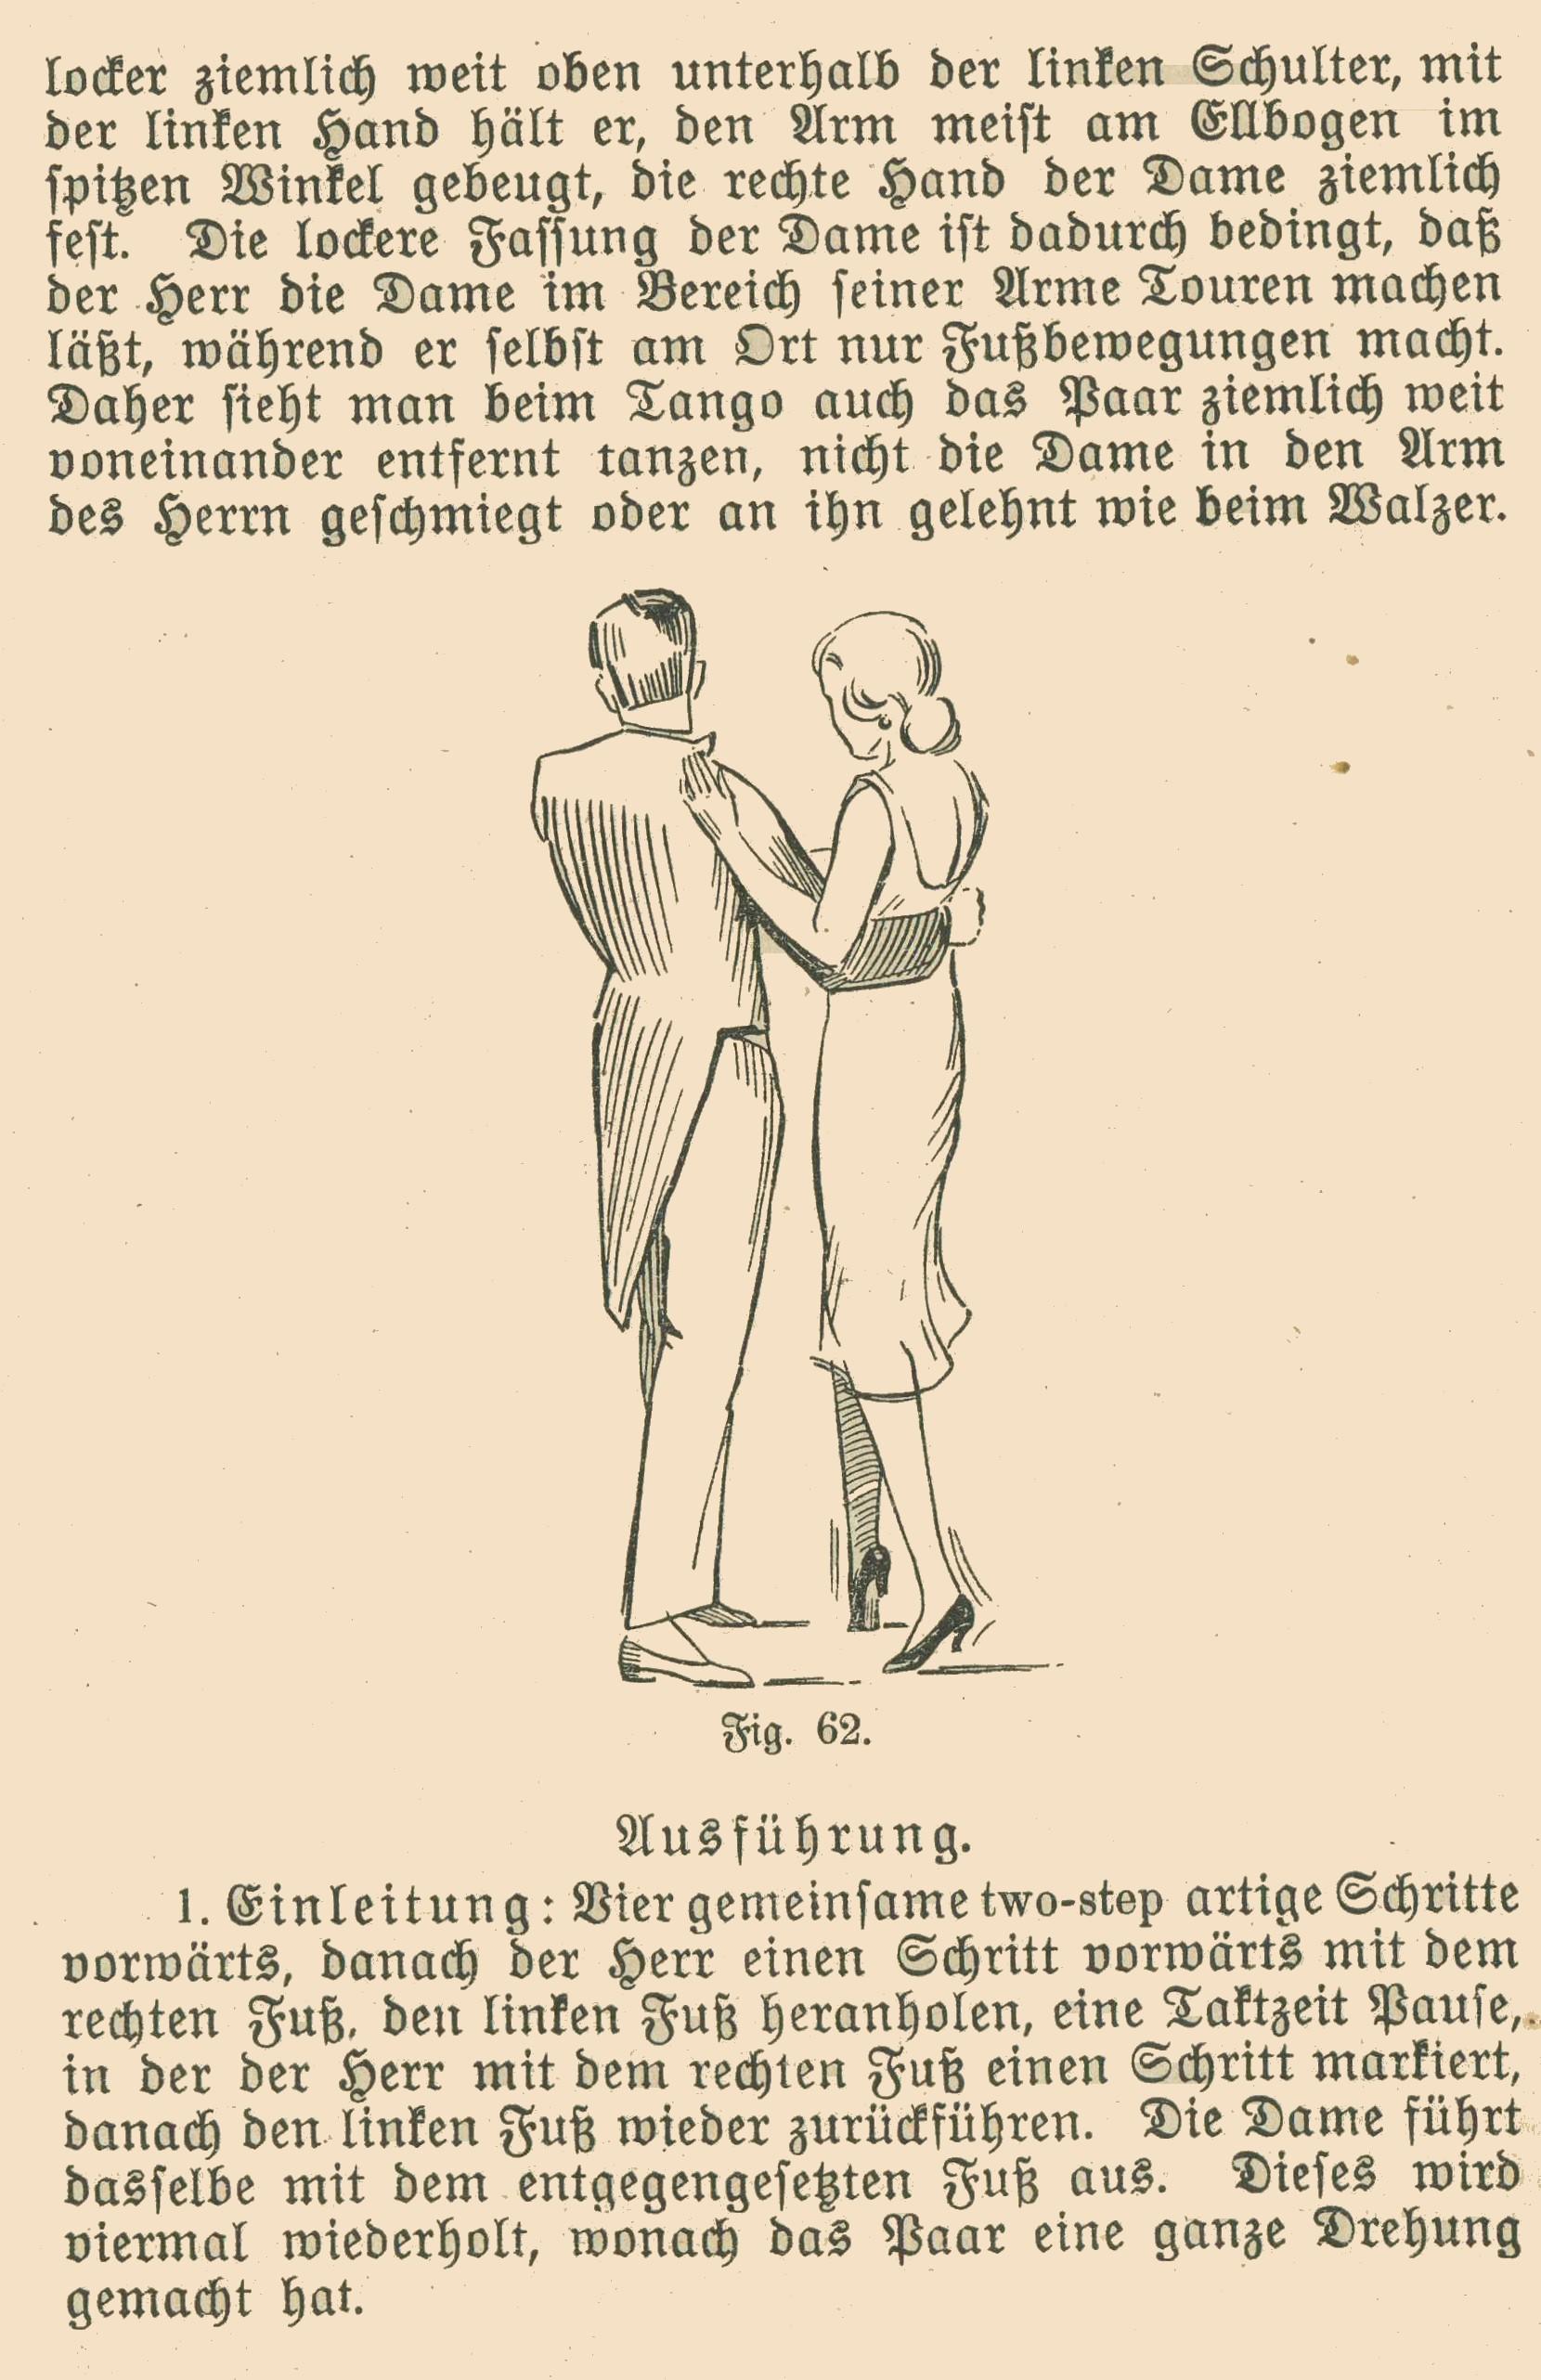 Tanzanleitung